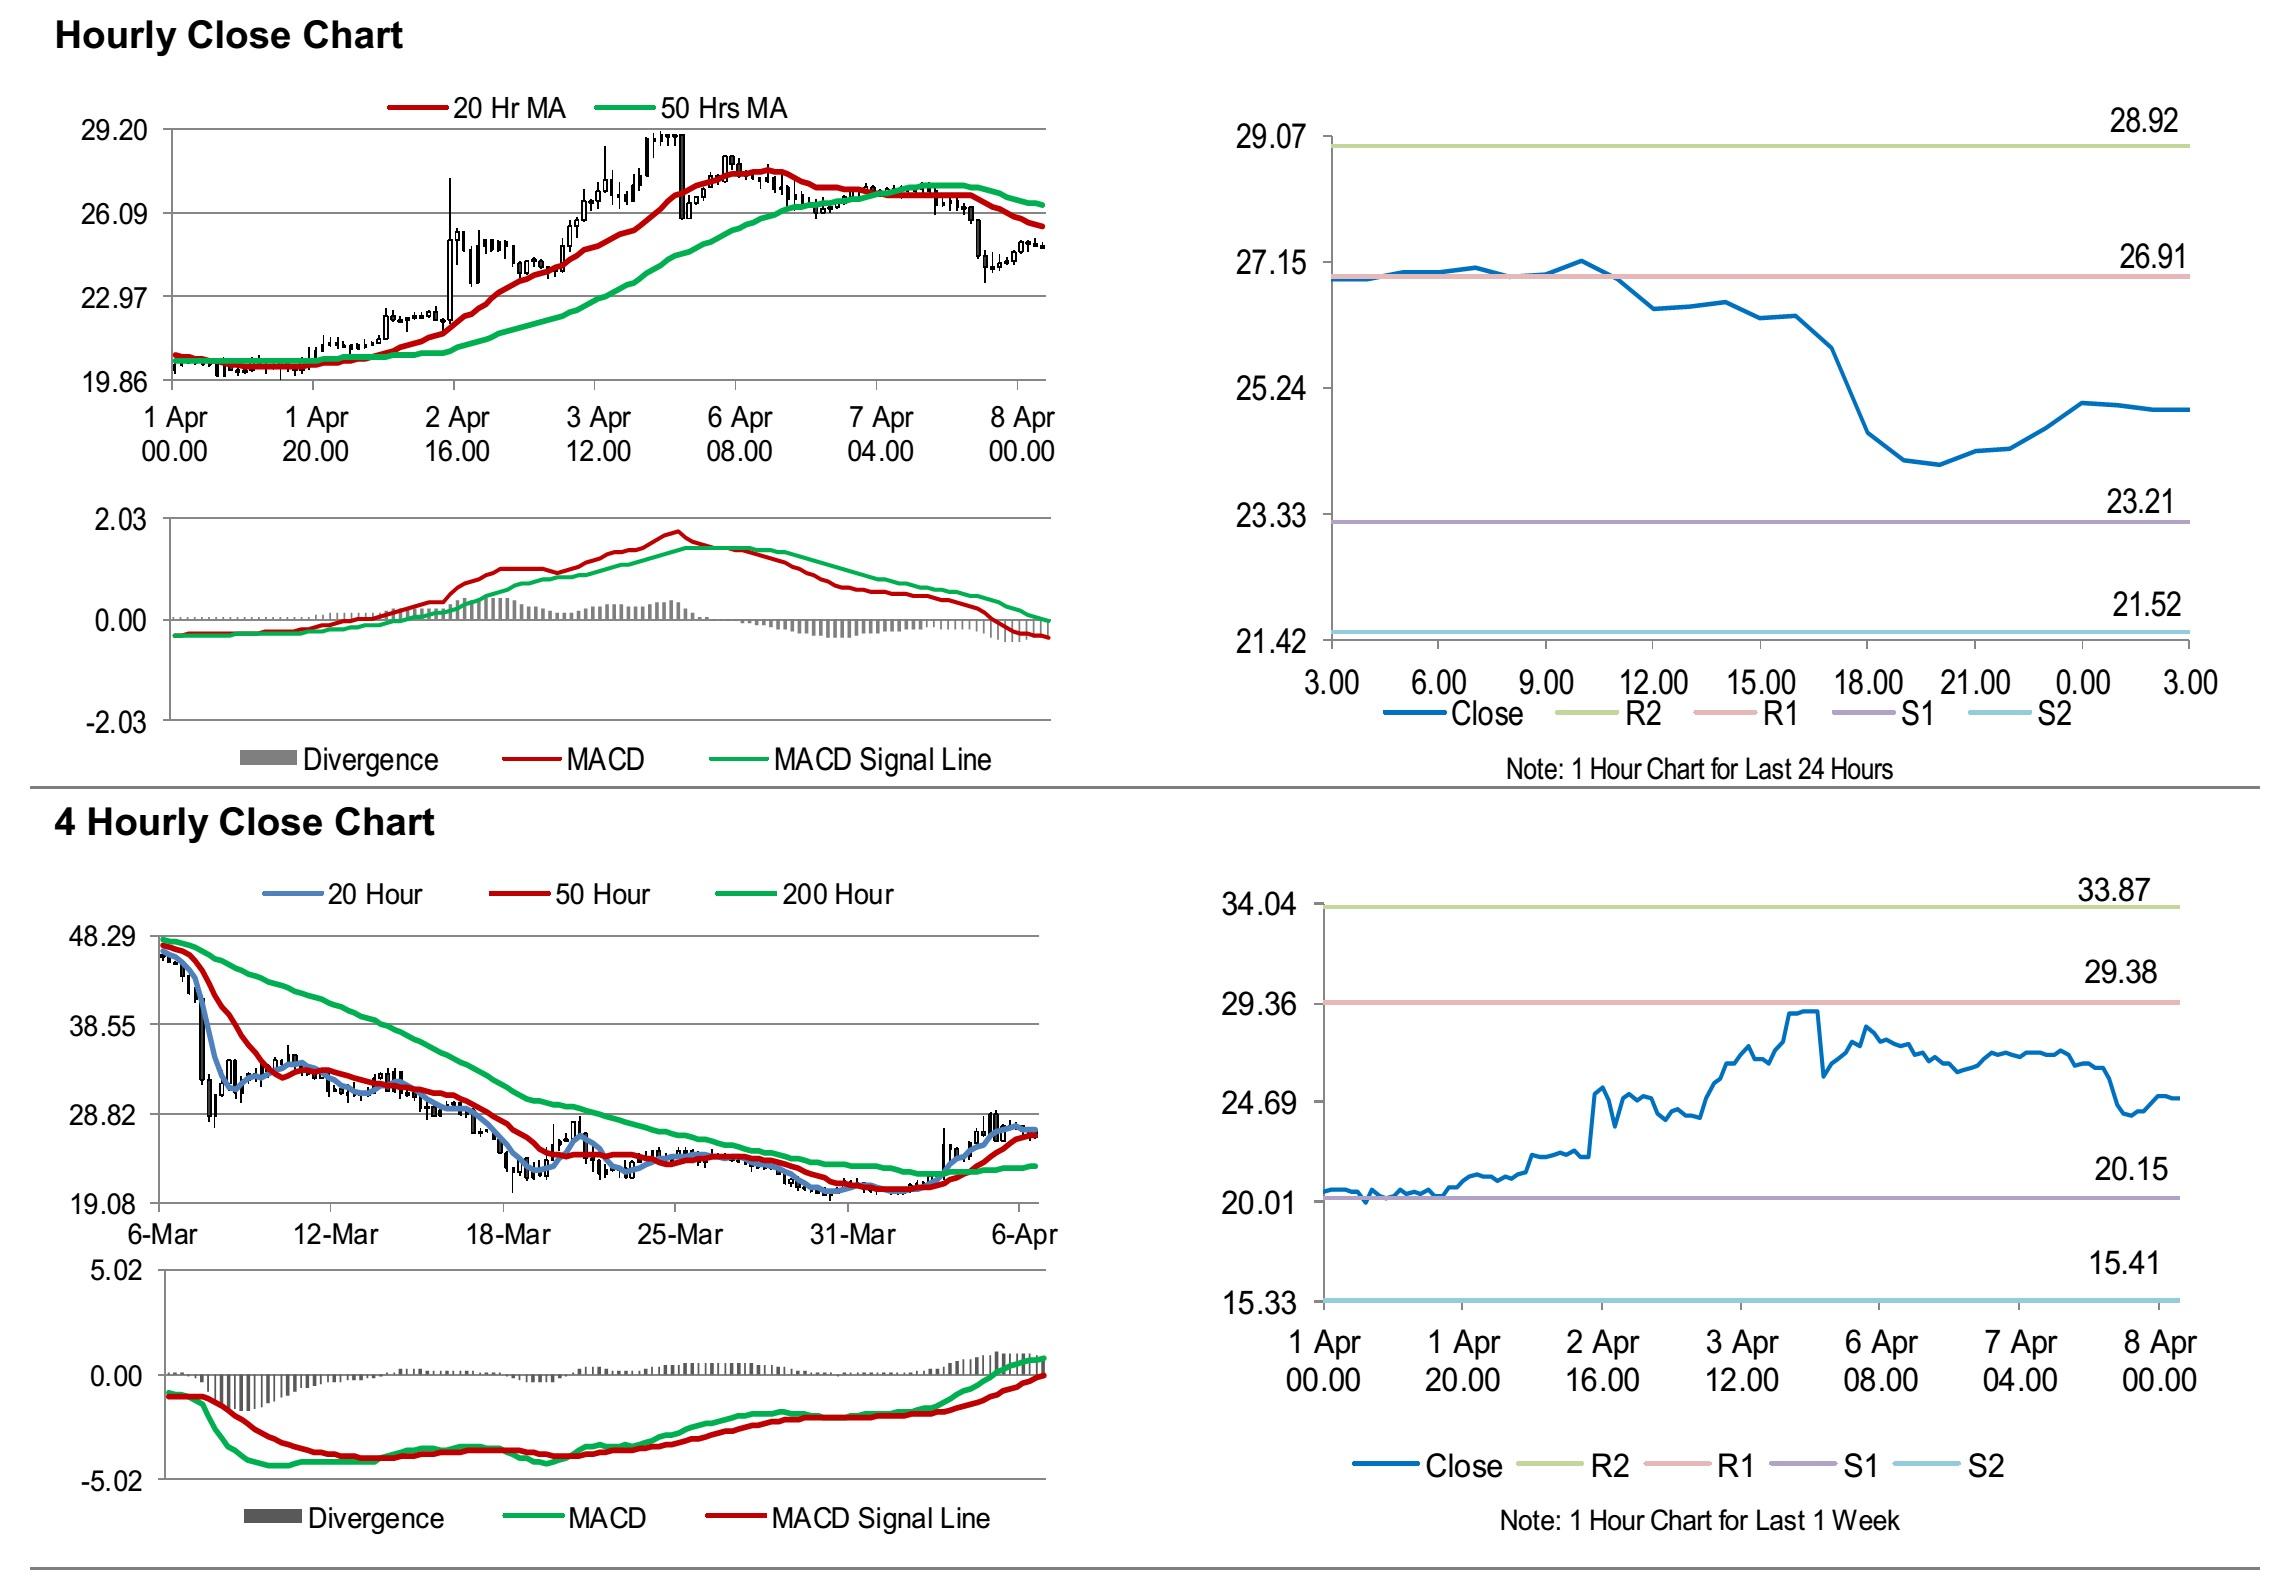 Crude Oil Oil Trading Higher Ahead Of Eia S Weekly Crude Oil